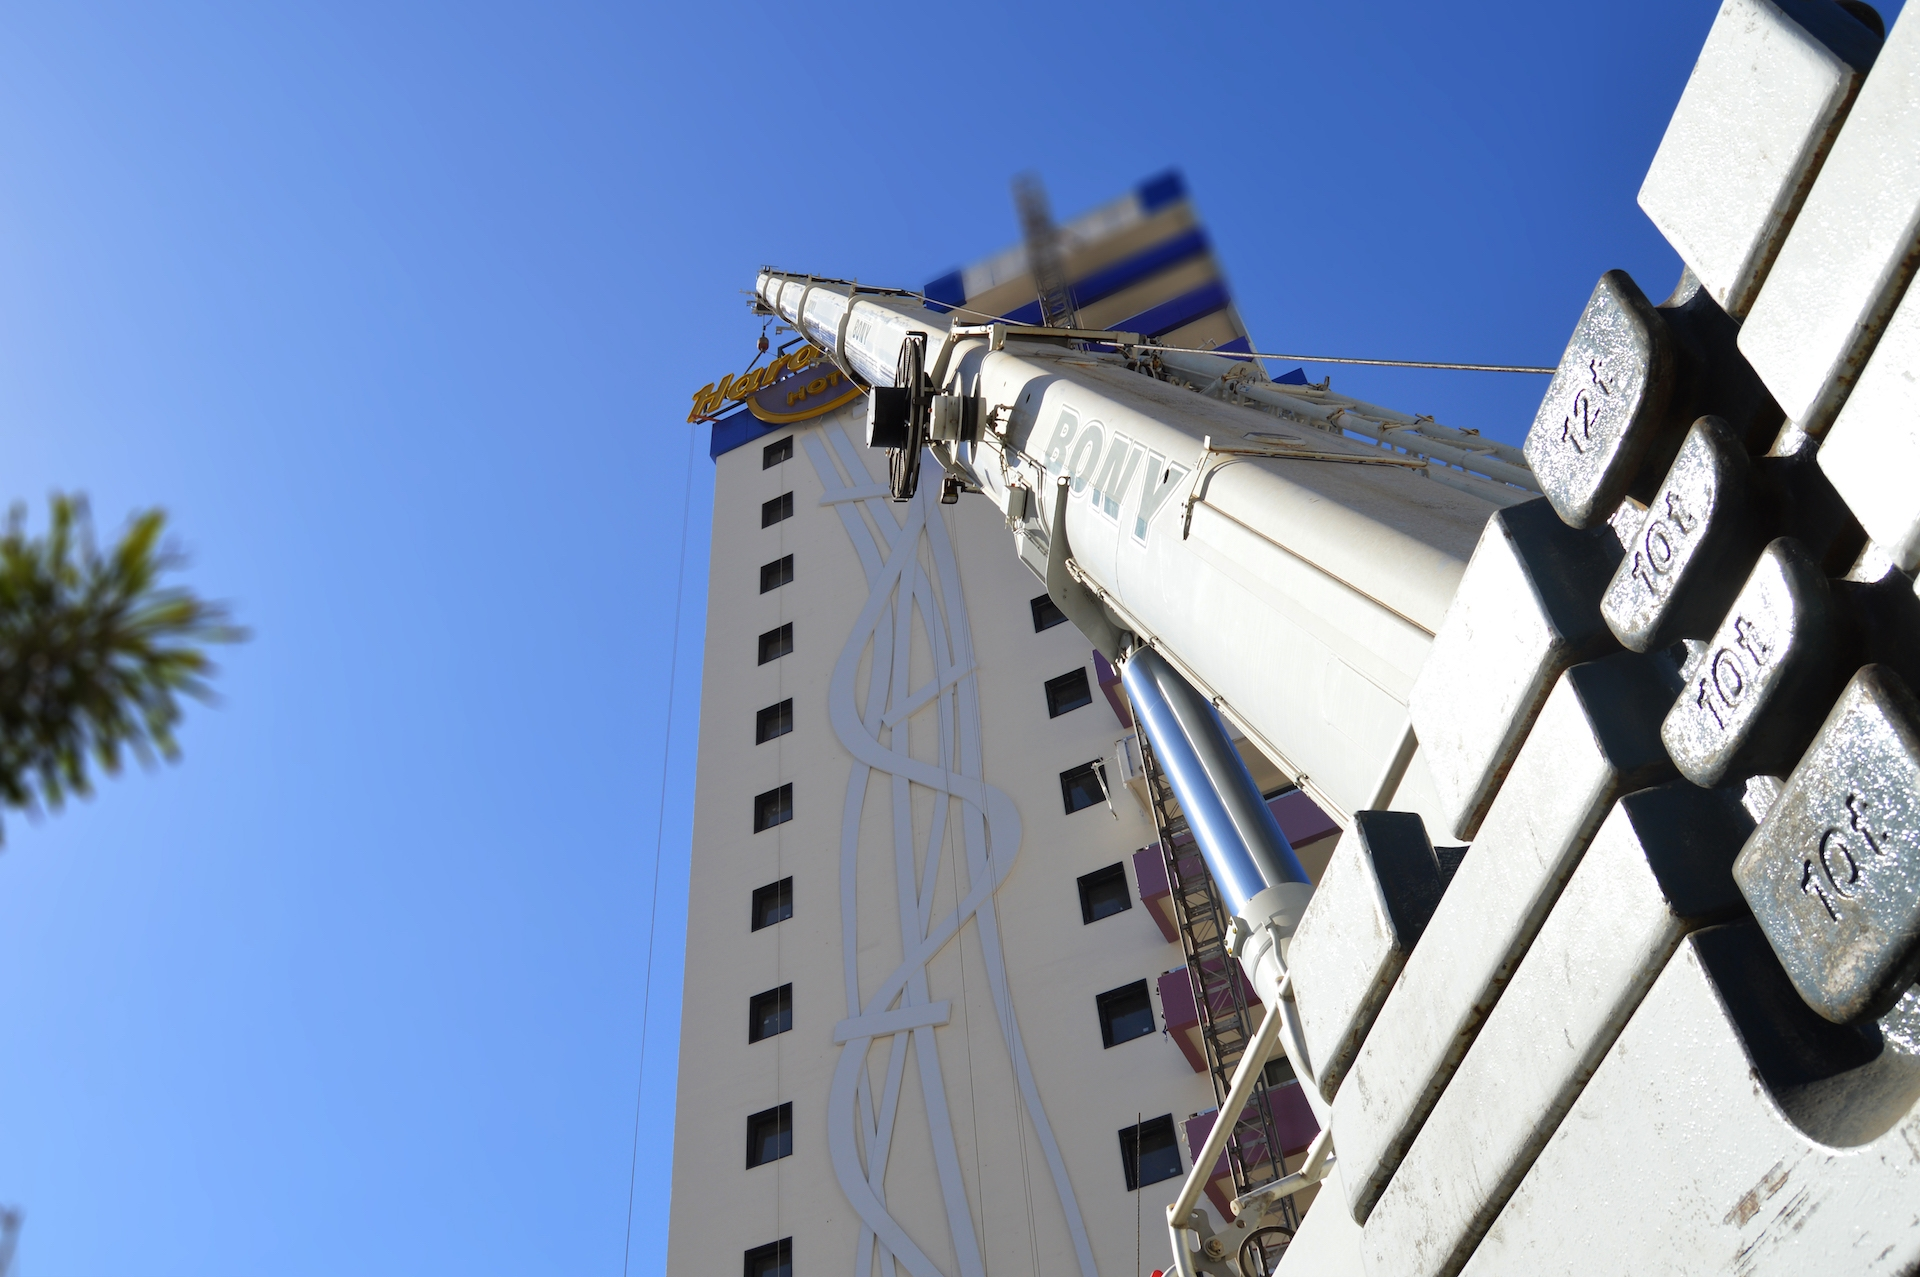 Lógistca e instalacion de luminosos corpóreos, Hard Rock Hotel Tenerife